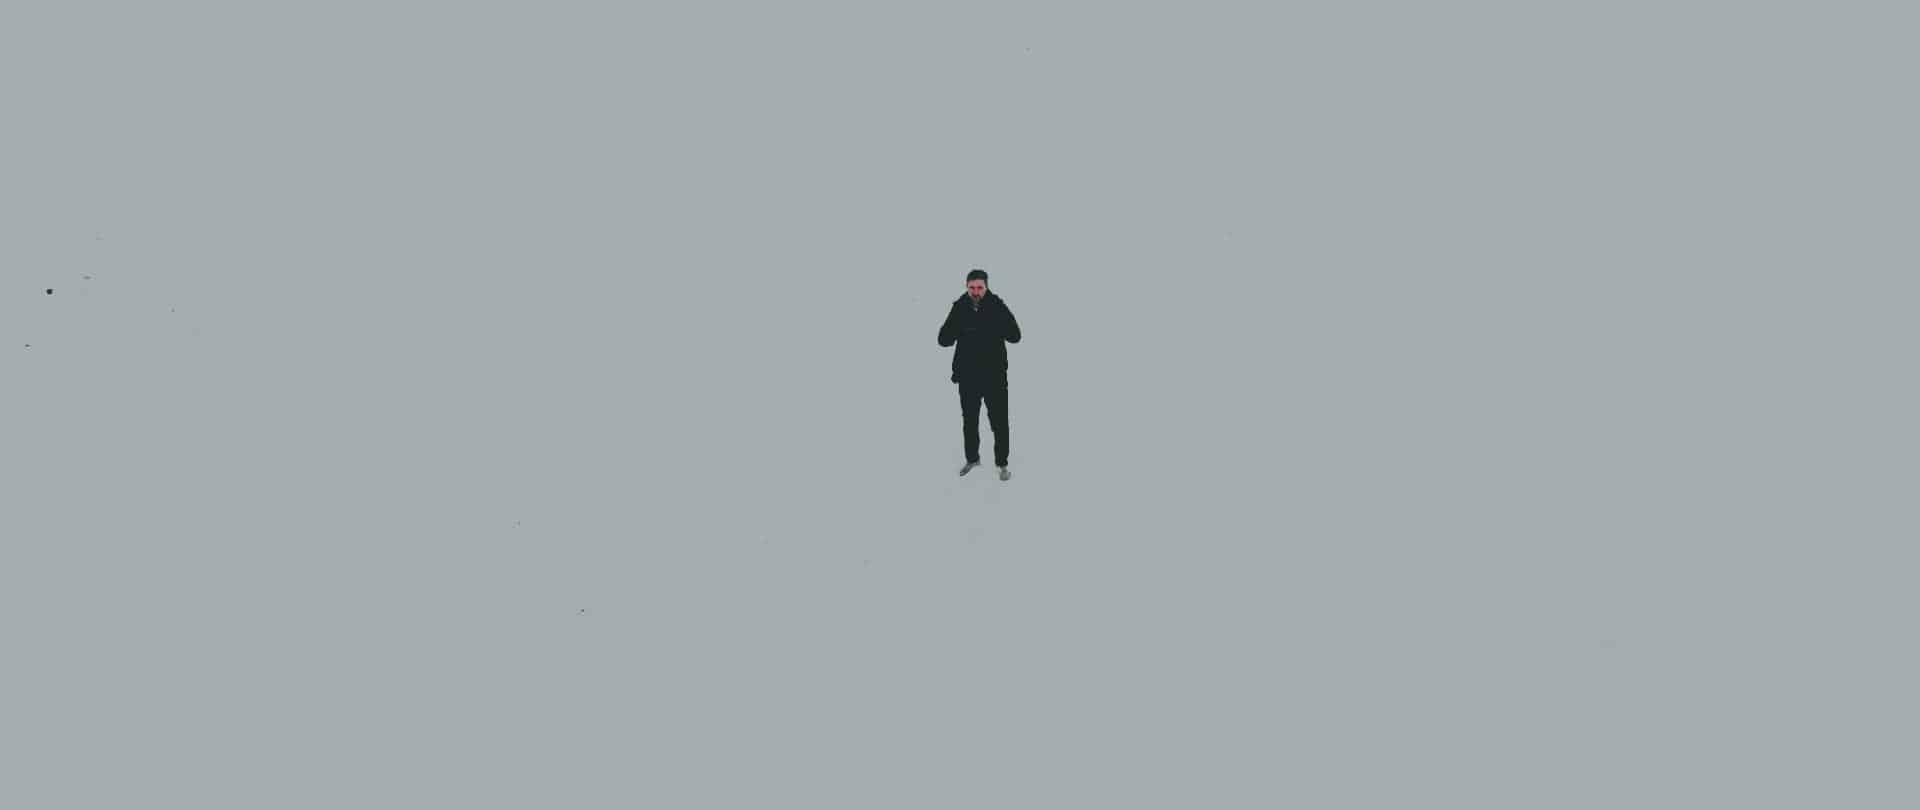 Blazin'Daniel - Reanimation (Musikvideo).00_03_27_11.Standbild256